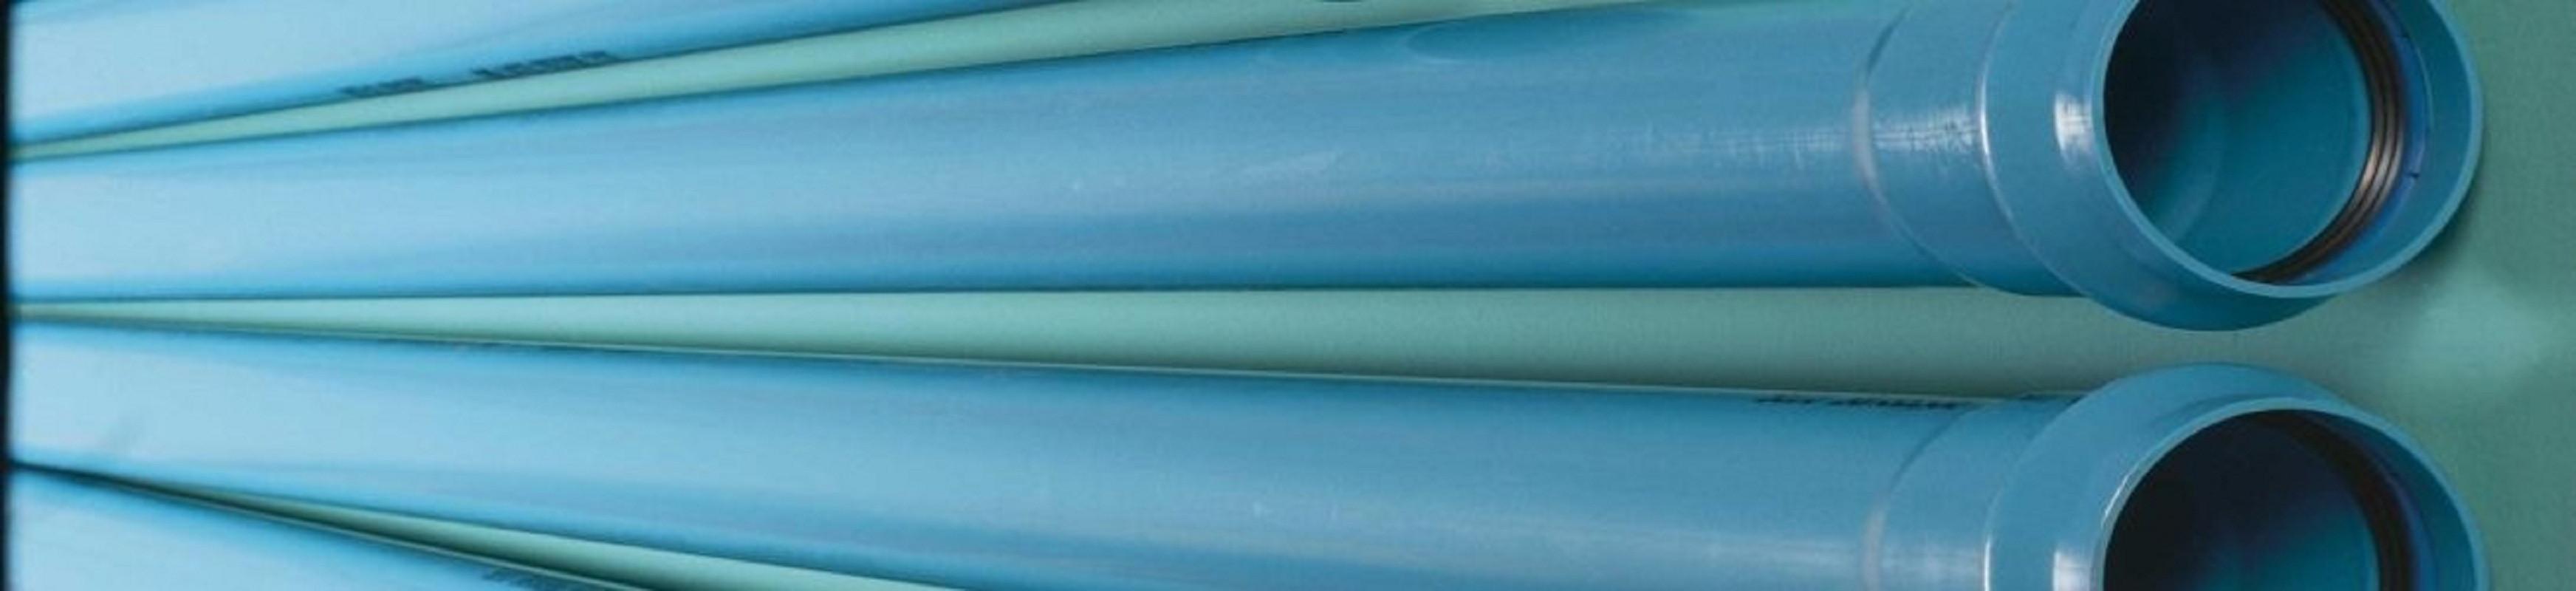 Aquaforce Watermain 10 Bar 110mm 6m